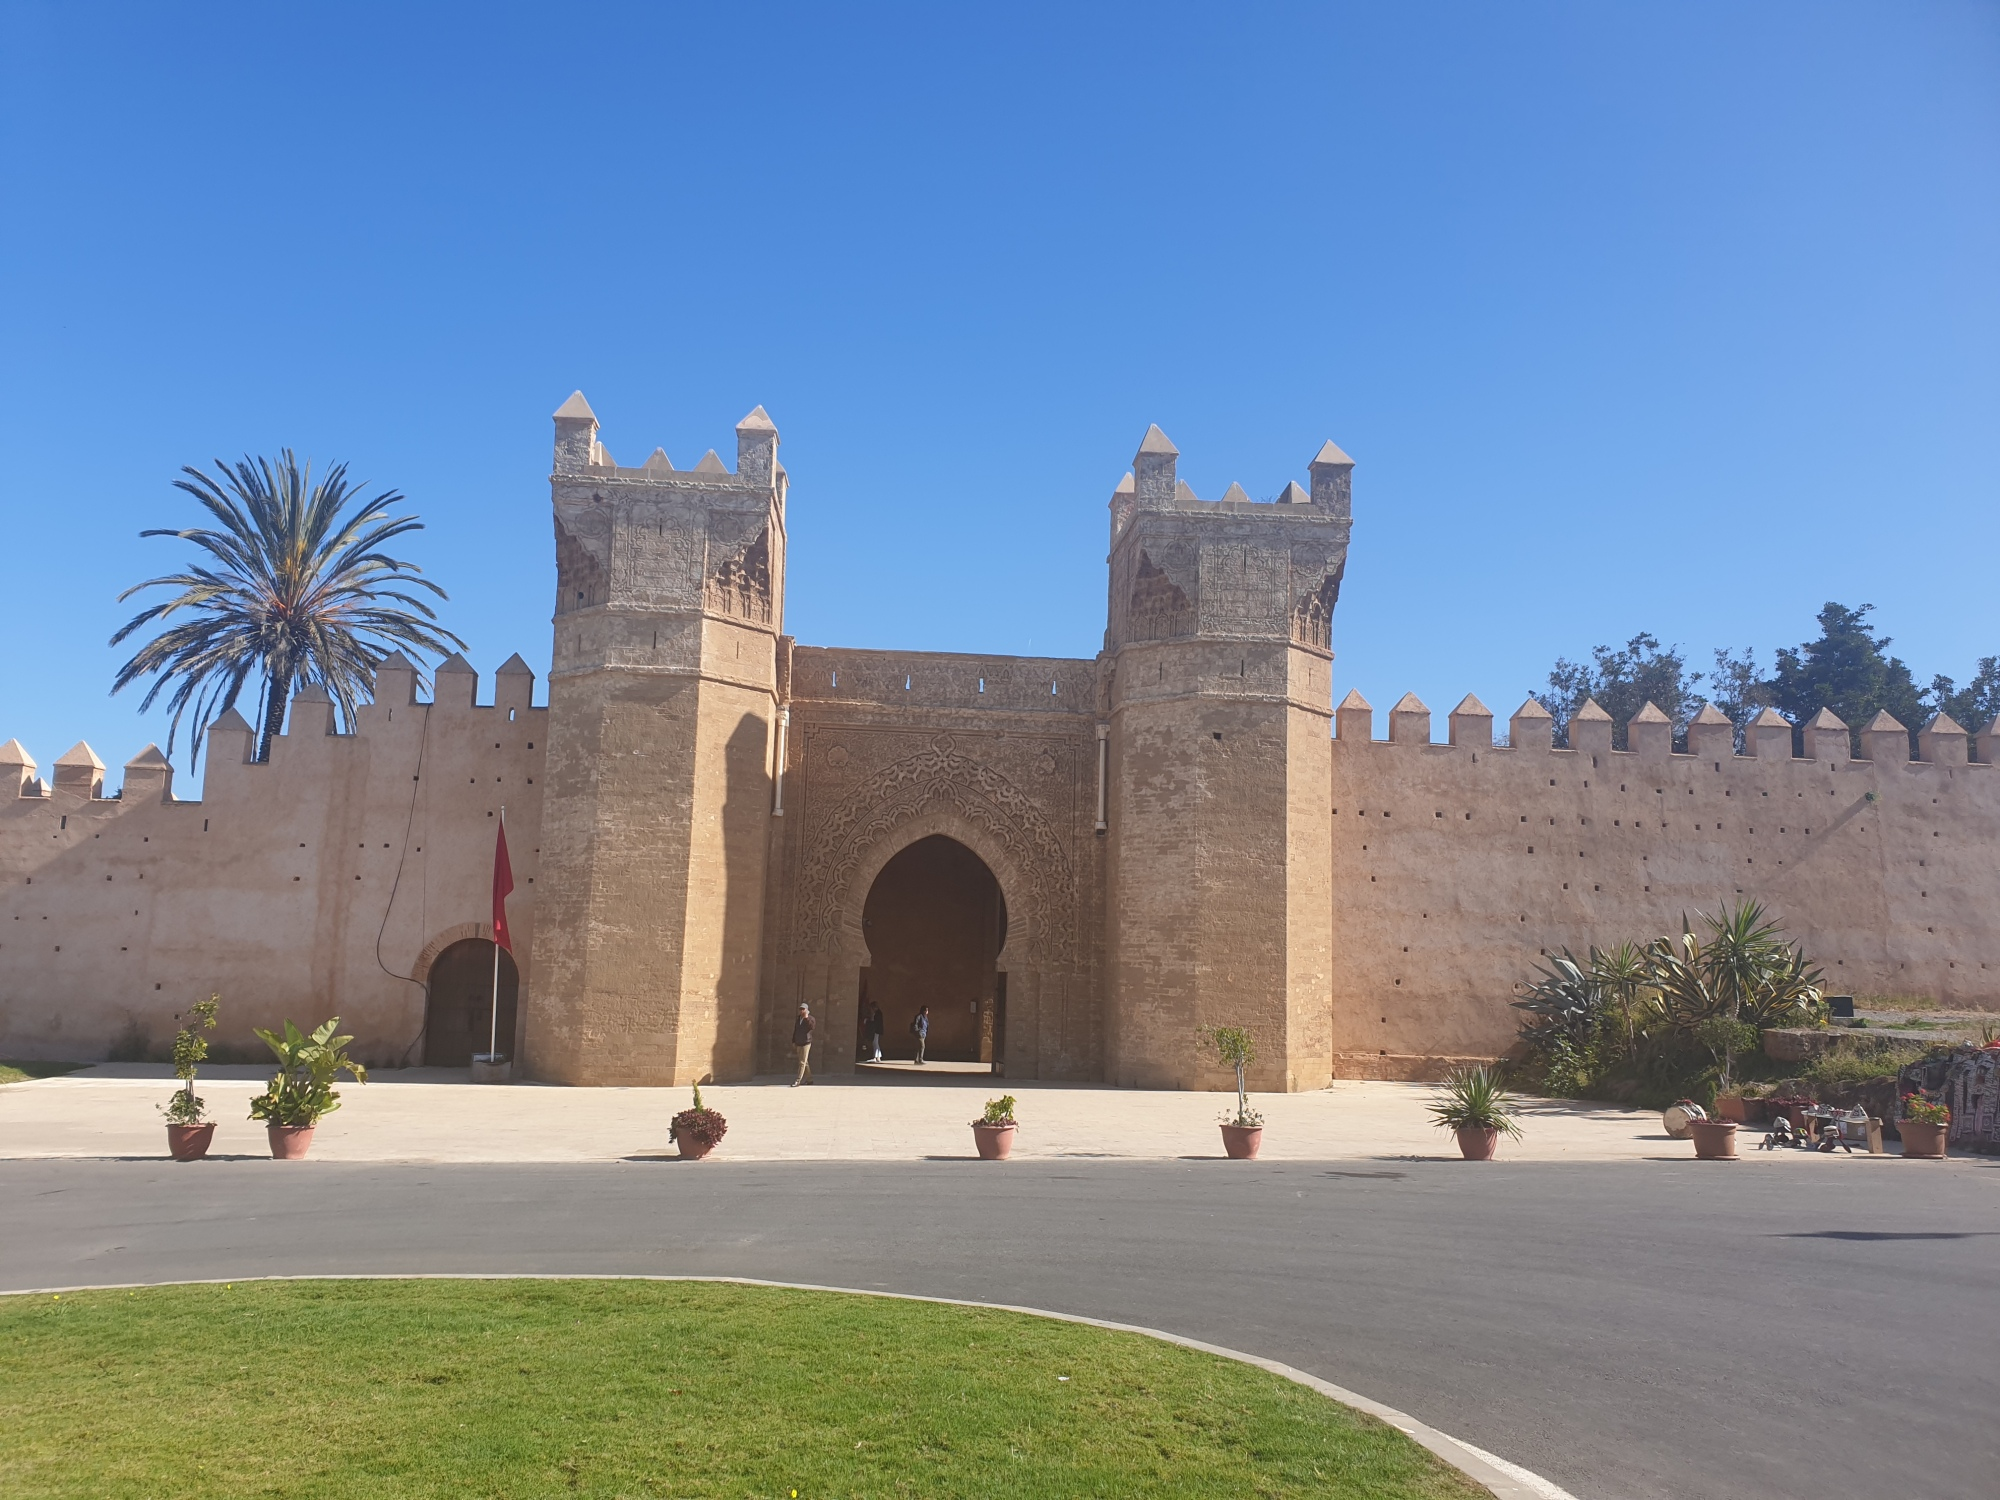 la porte principale de Chellah au Maroc